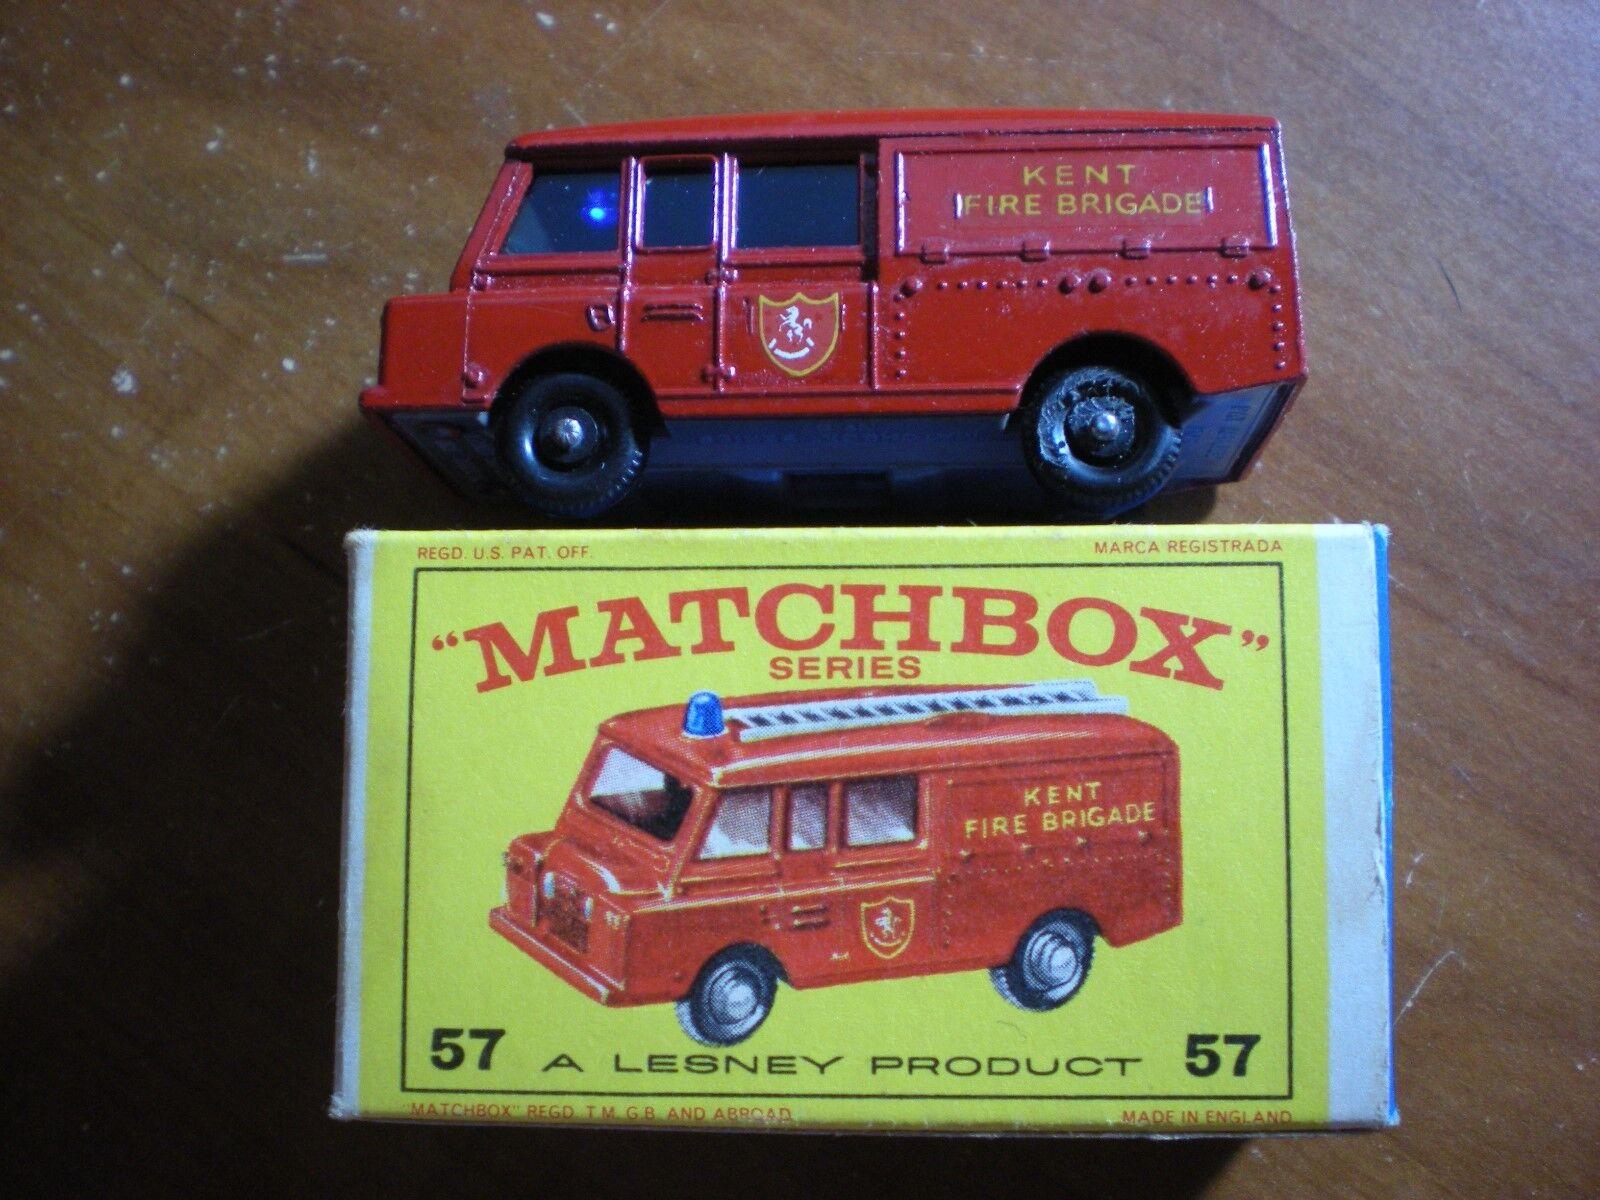 ventas calientes Nuevo Y En Caja Caja Caja Matchbox Series Nº 57 Kent Fire Brigade Land Rover Fire Truck  ventas en linea